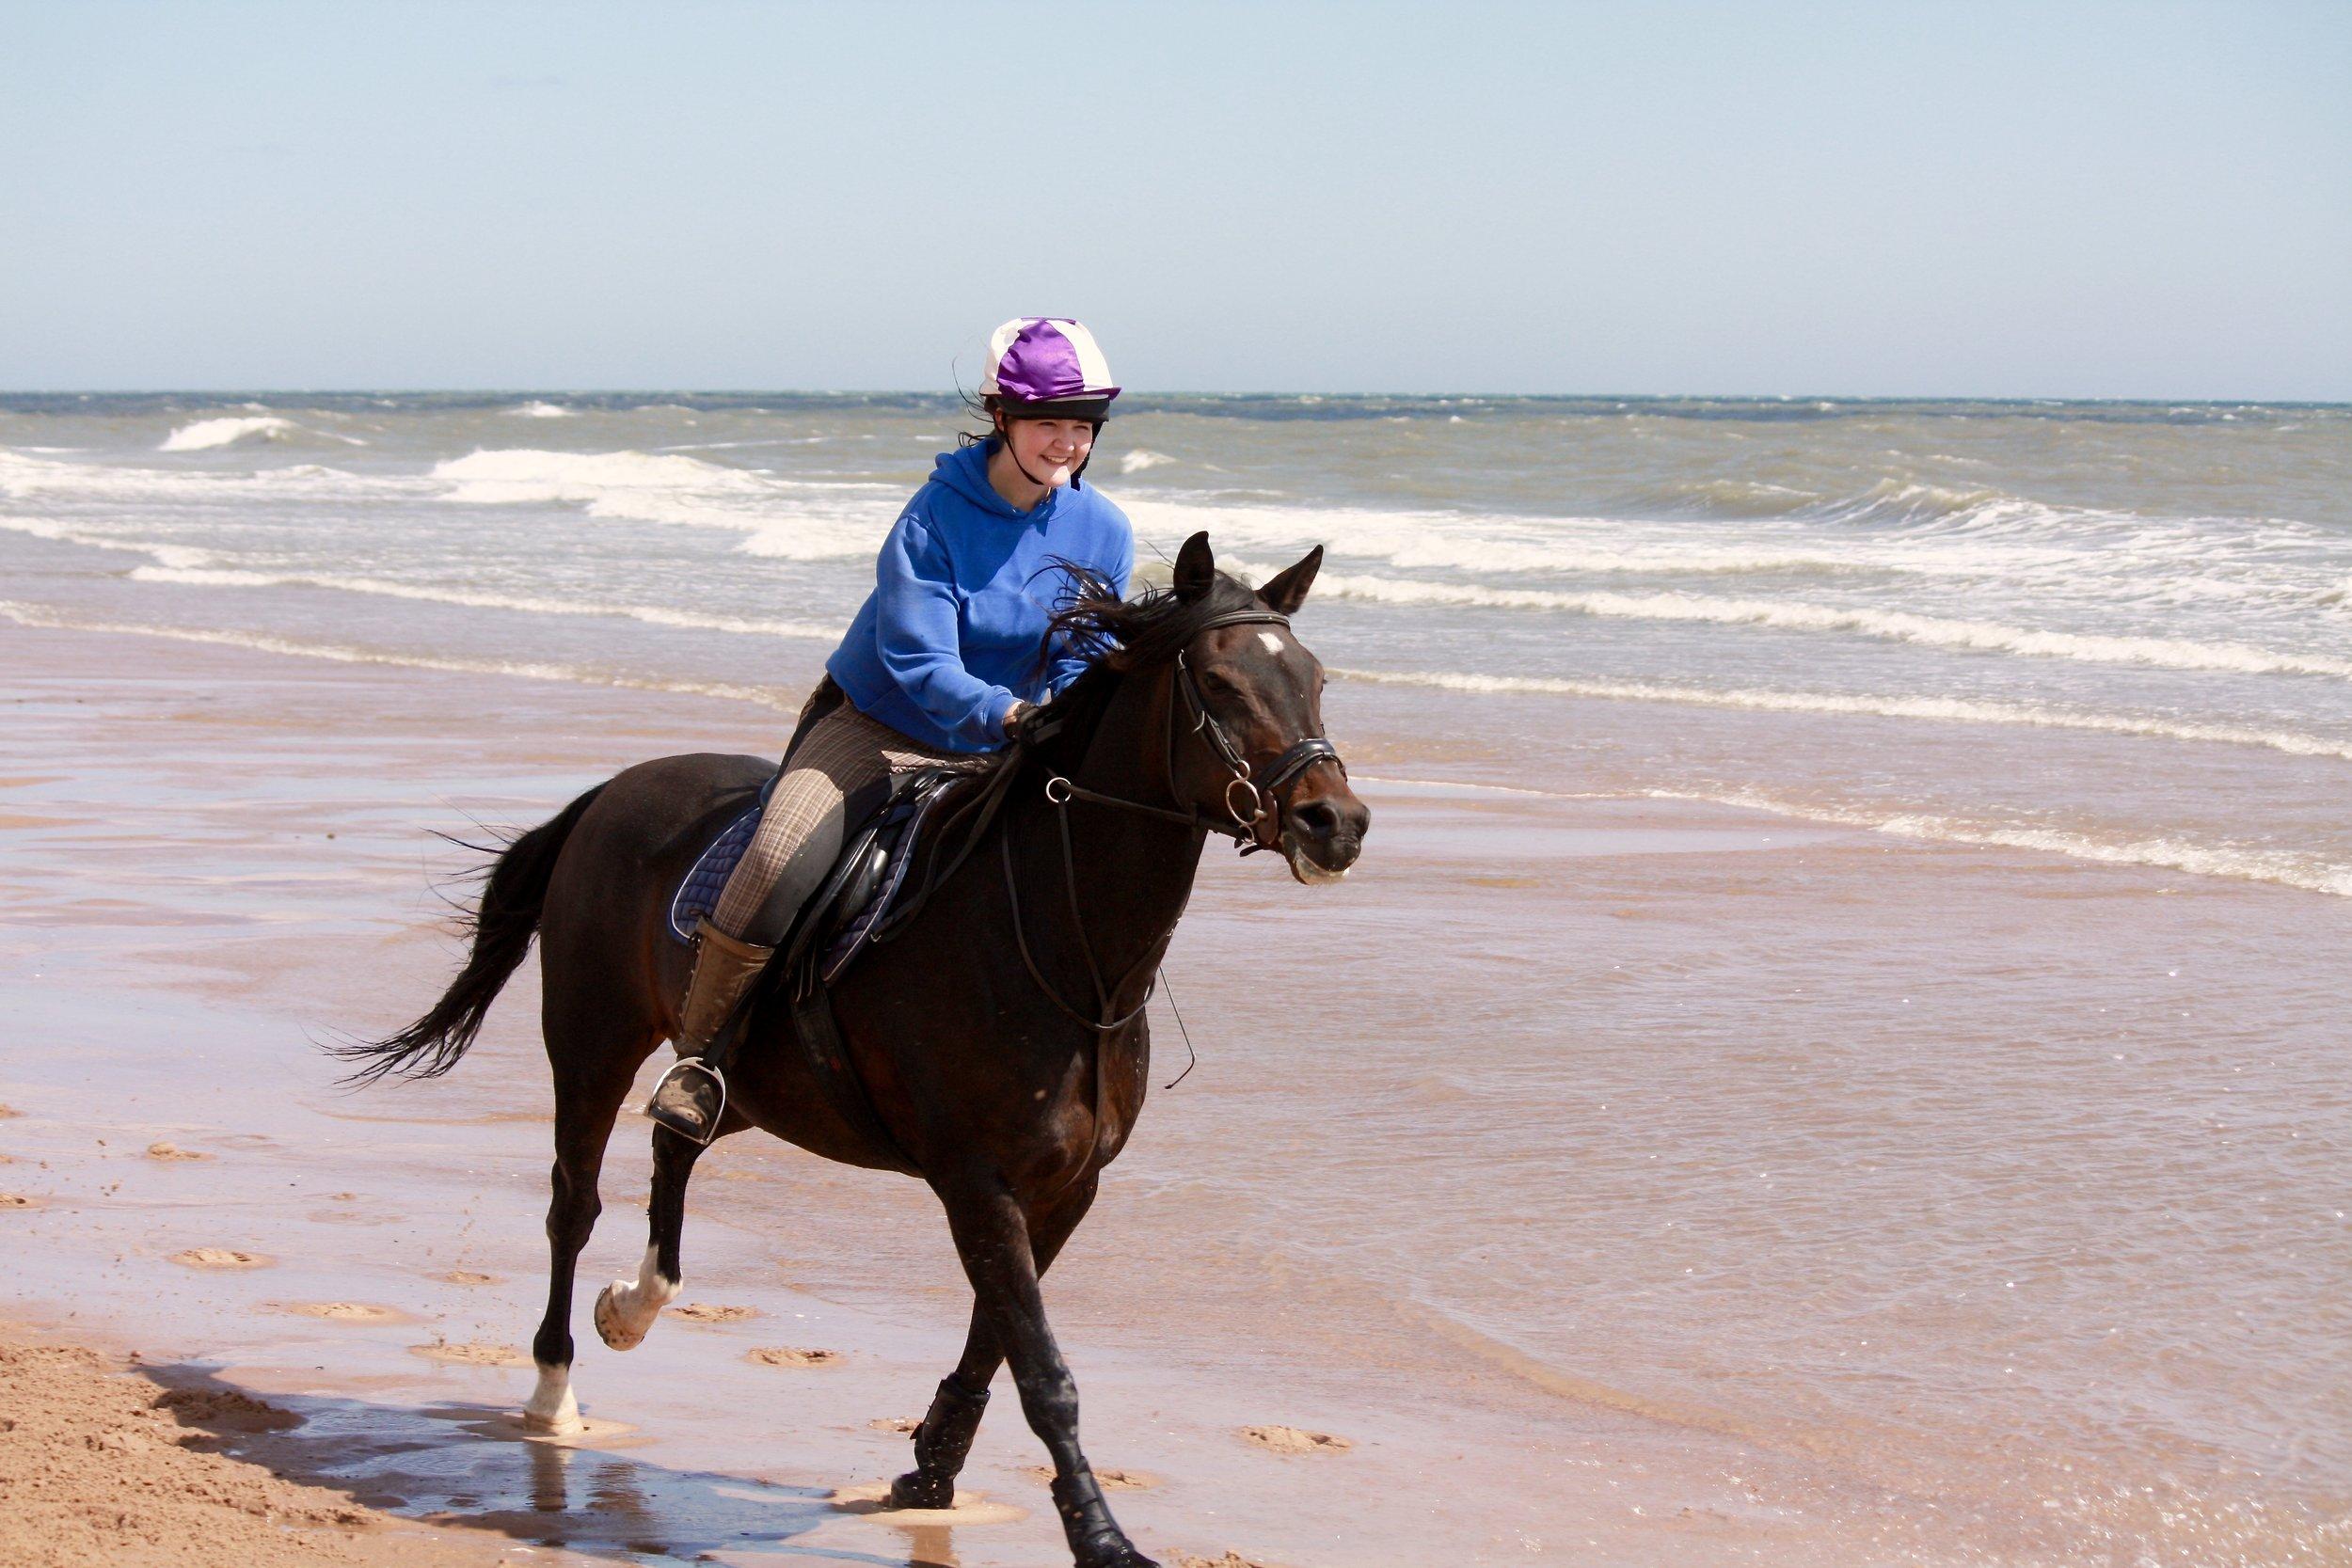 Chiara with horse Danny at the Balmedie Beach in Aberdeen.